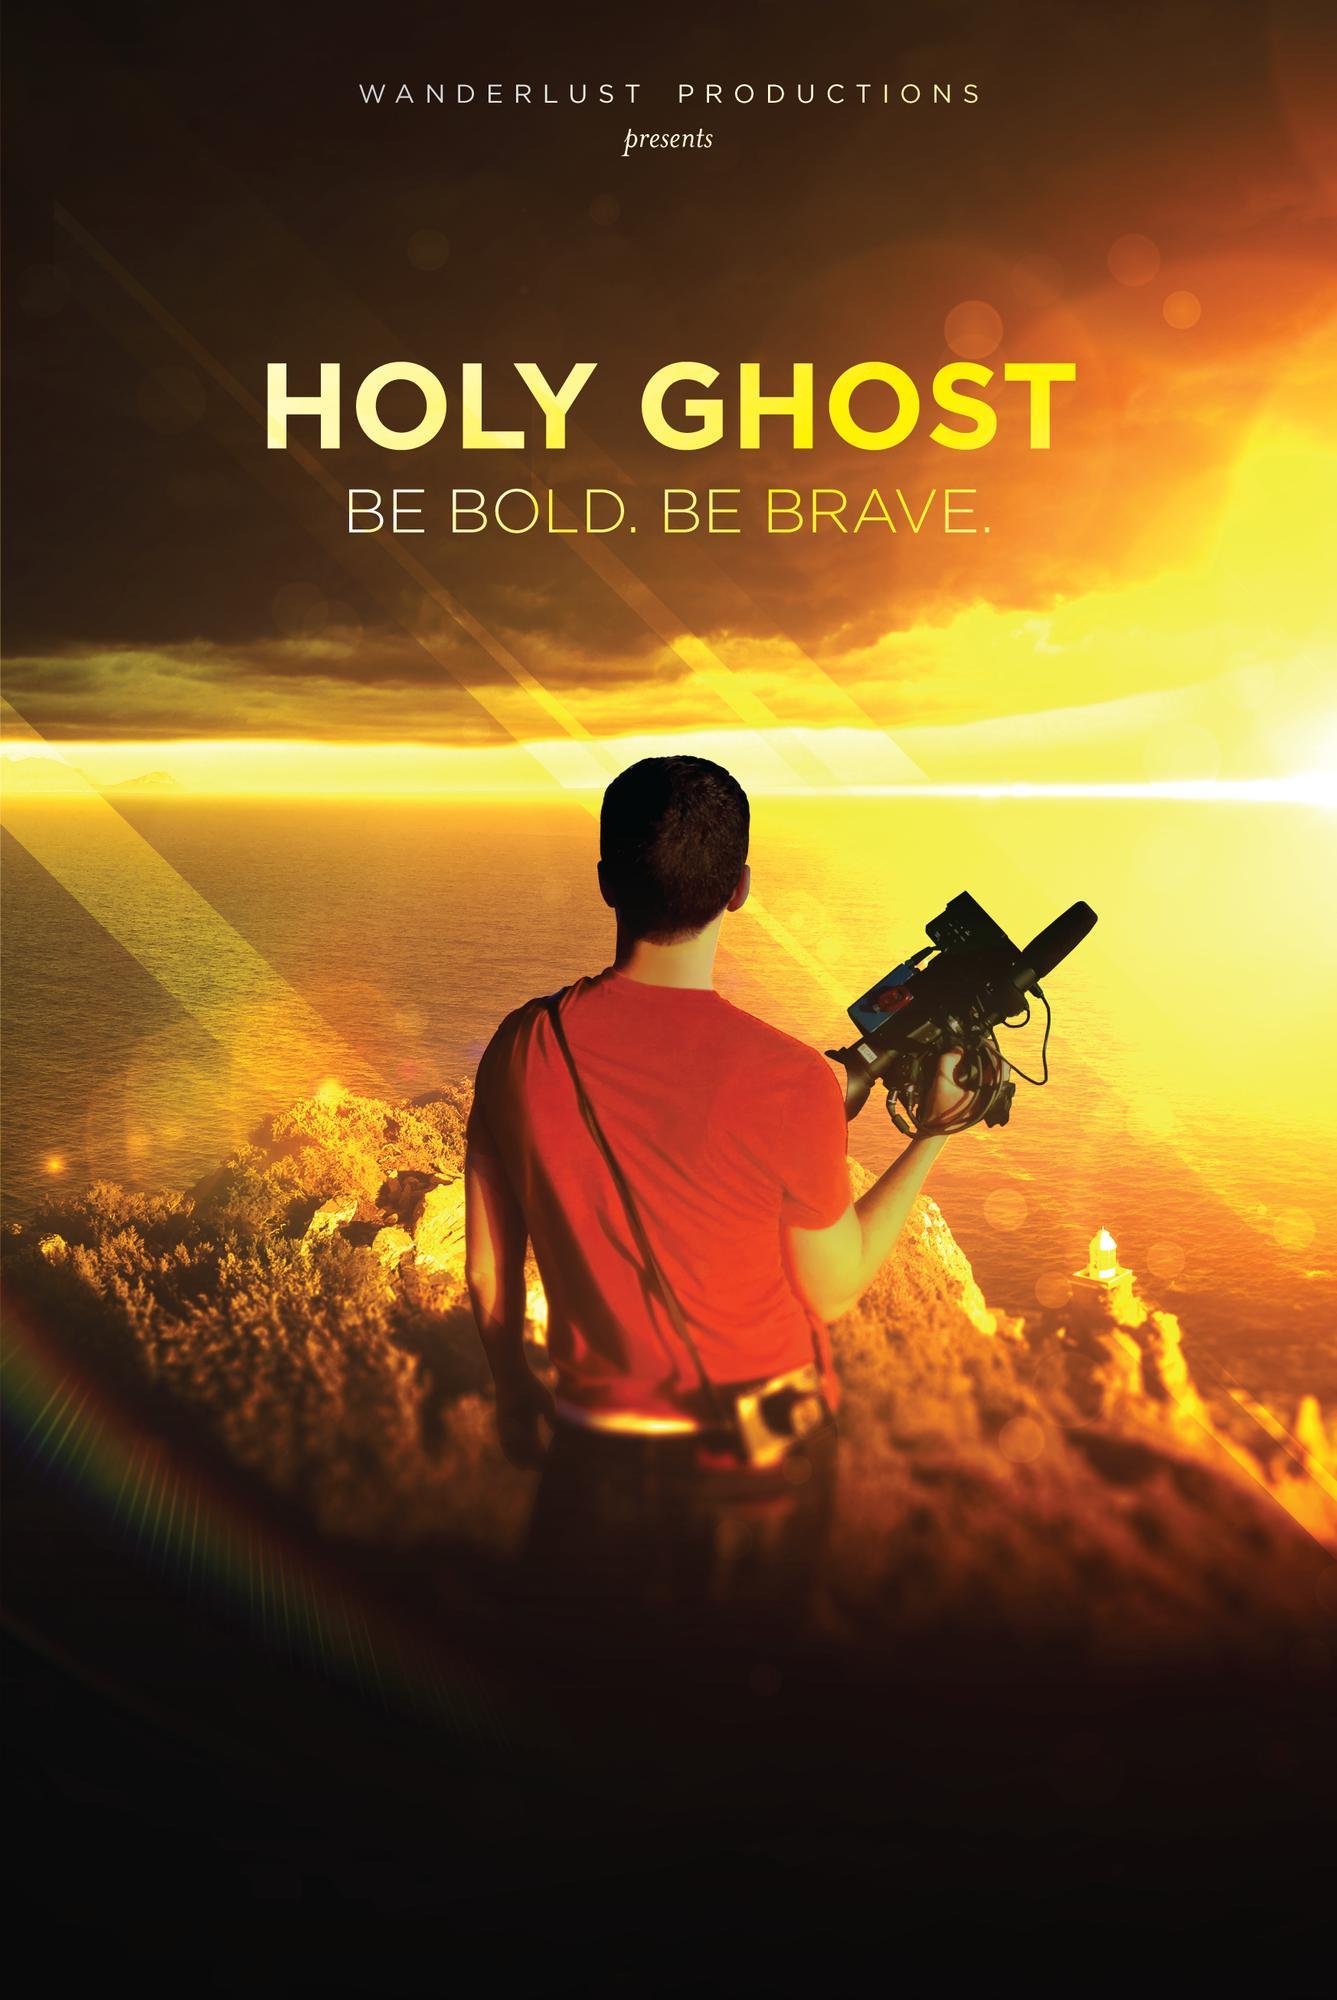 Holy ghost premiere tour kansas city